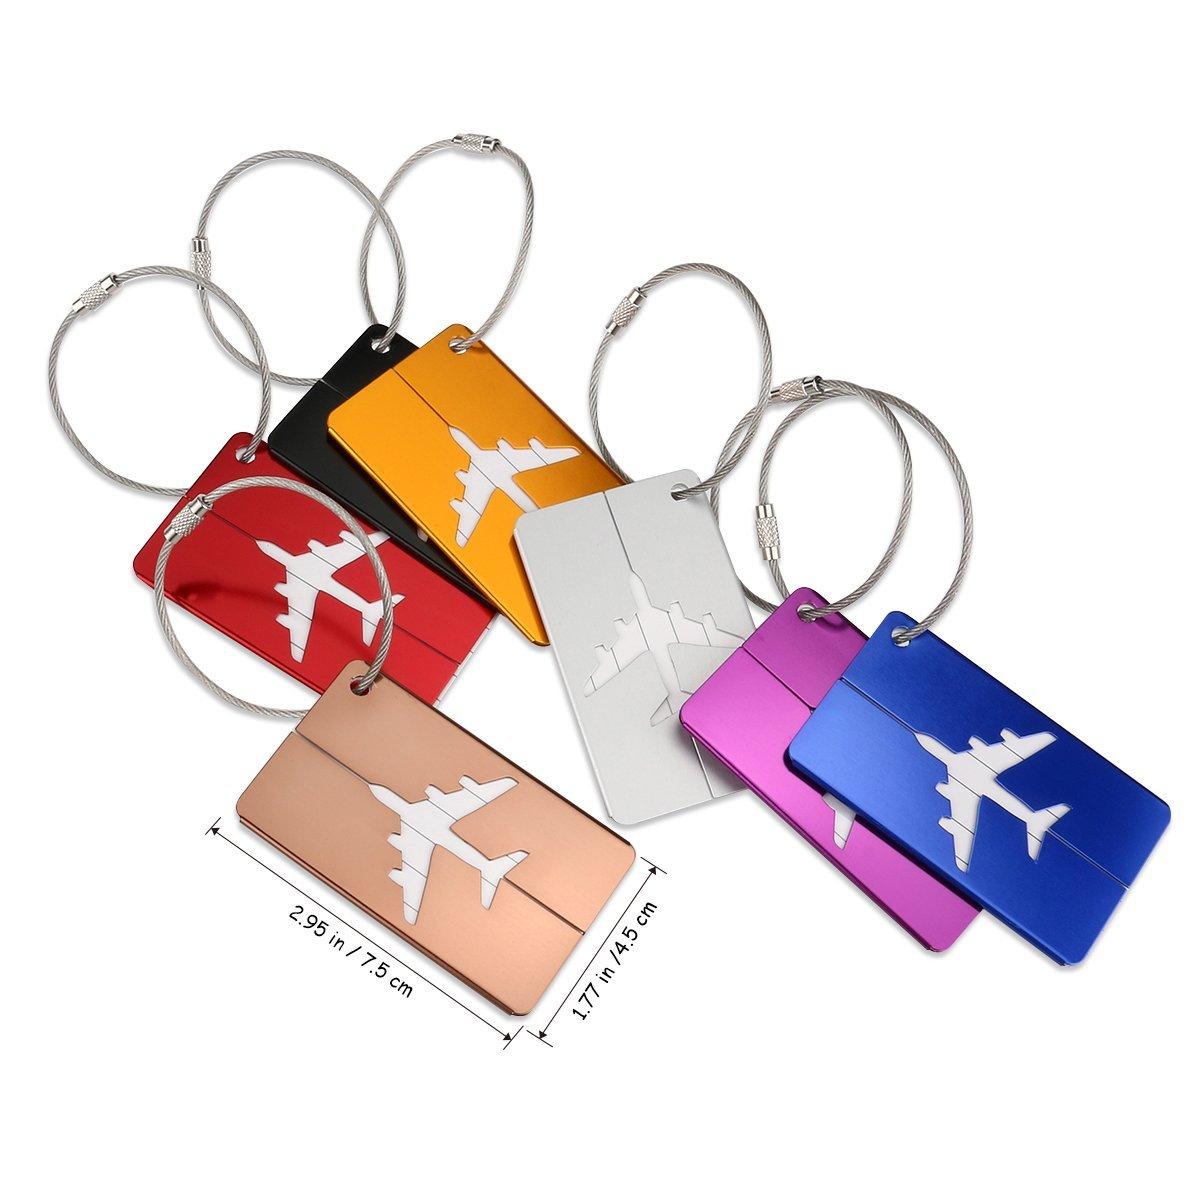 NUOLUX Luggage Tag Suitcase Bag Tag Handbag ID Tag with Key Ring 8pcs